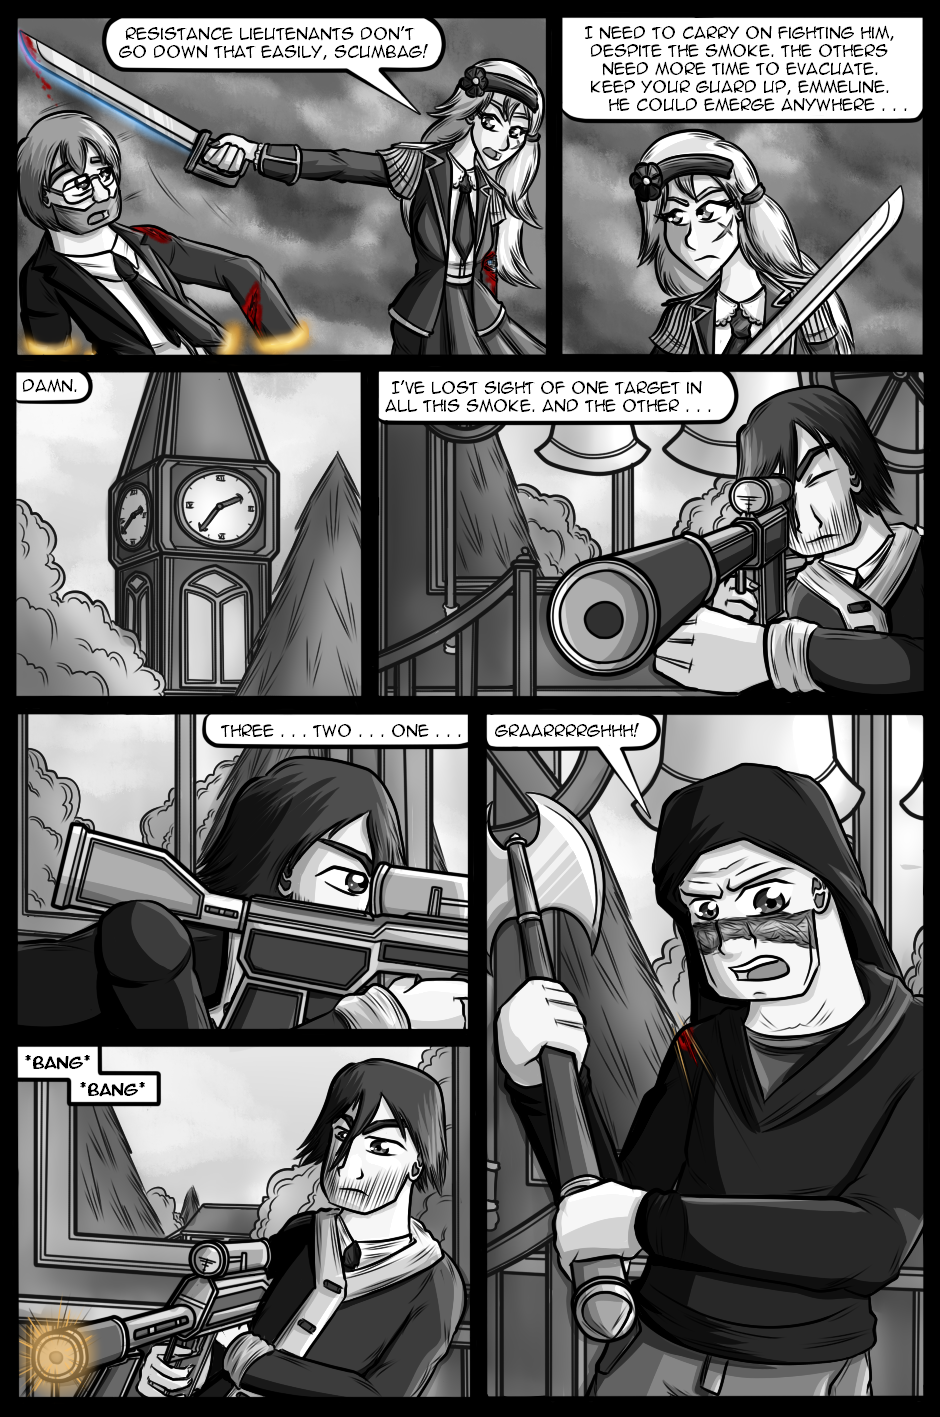 Fire Suppression, Part 51